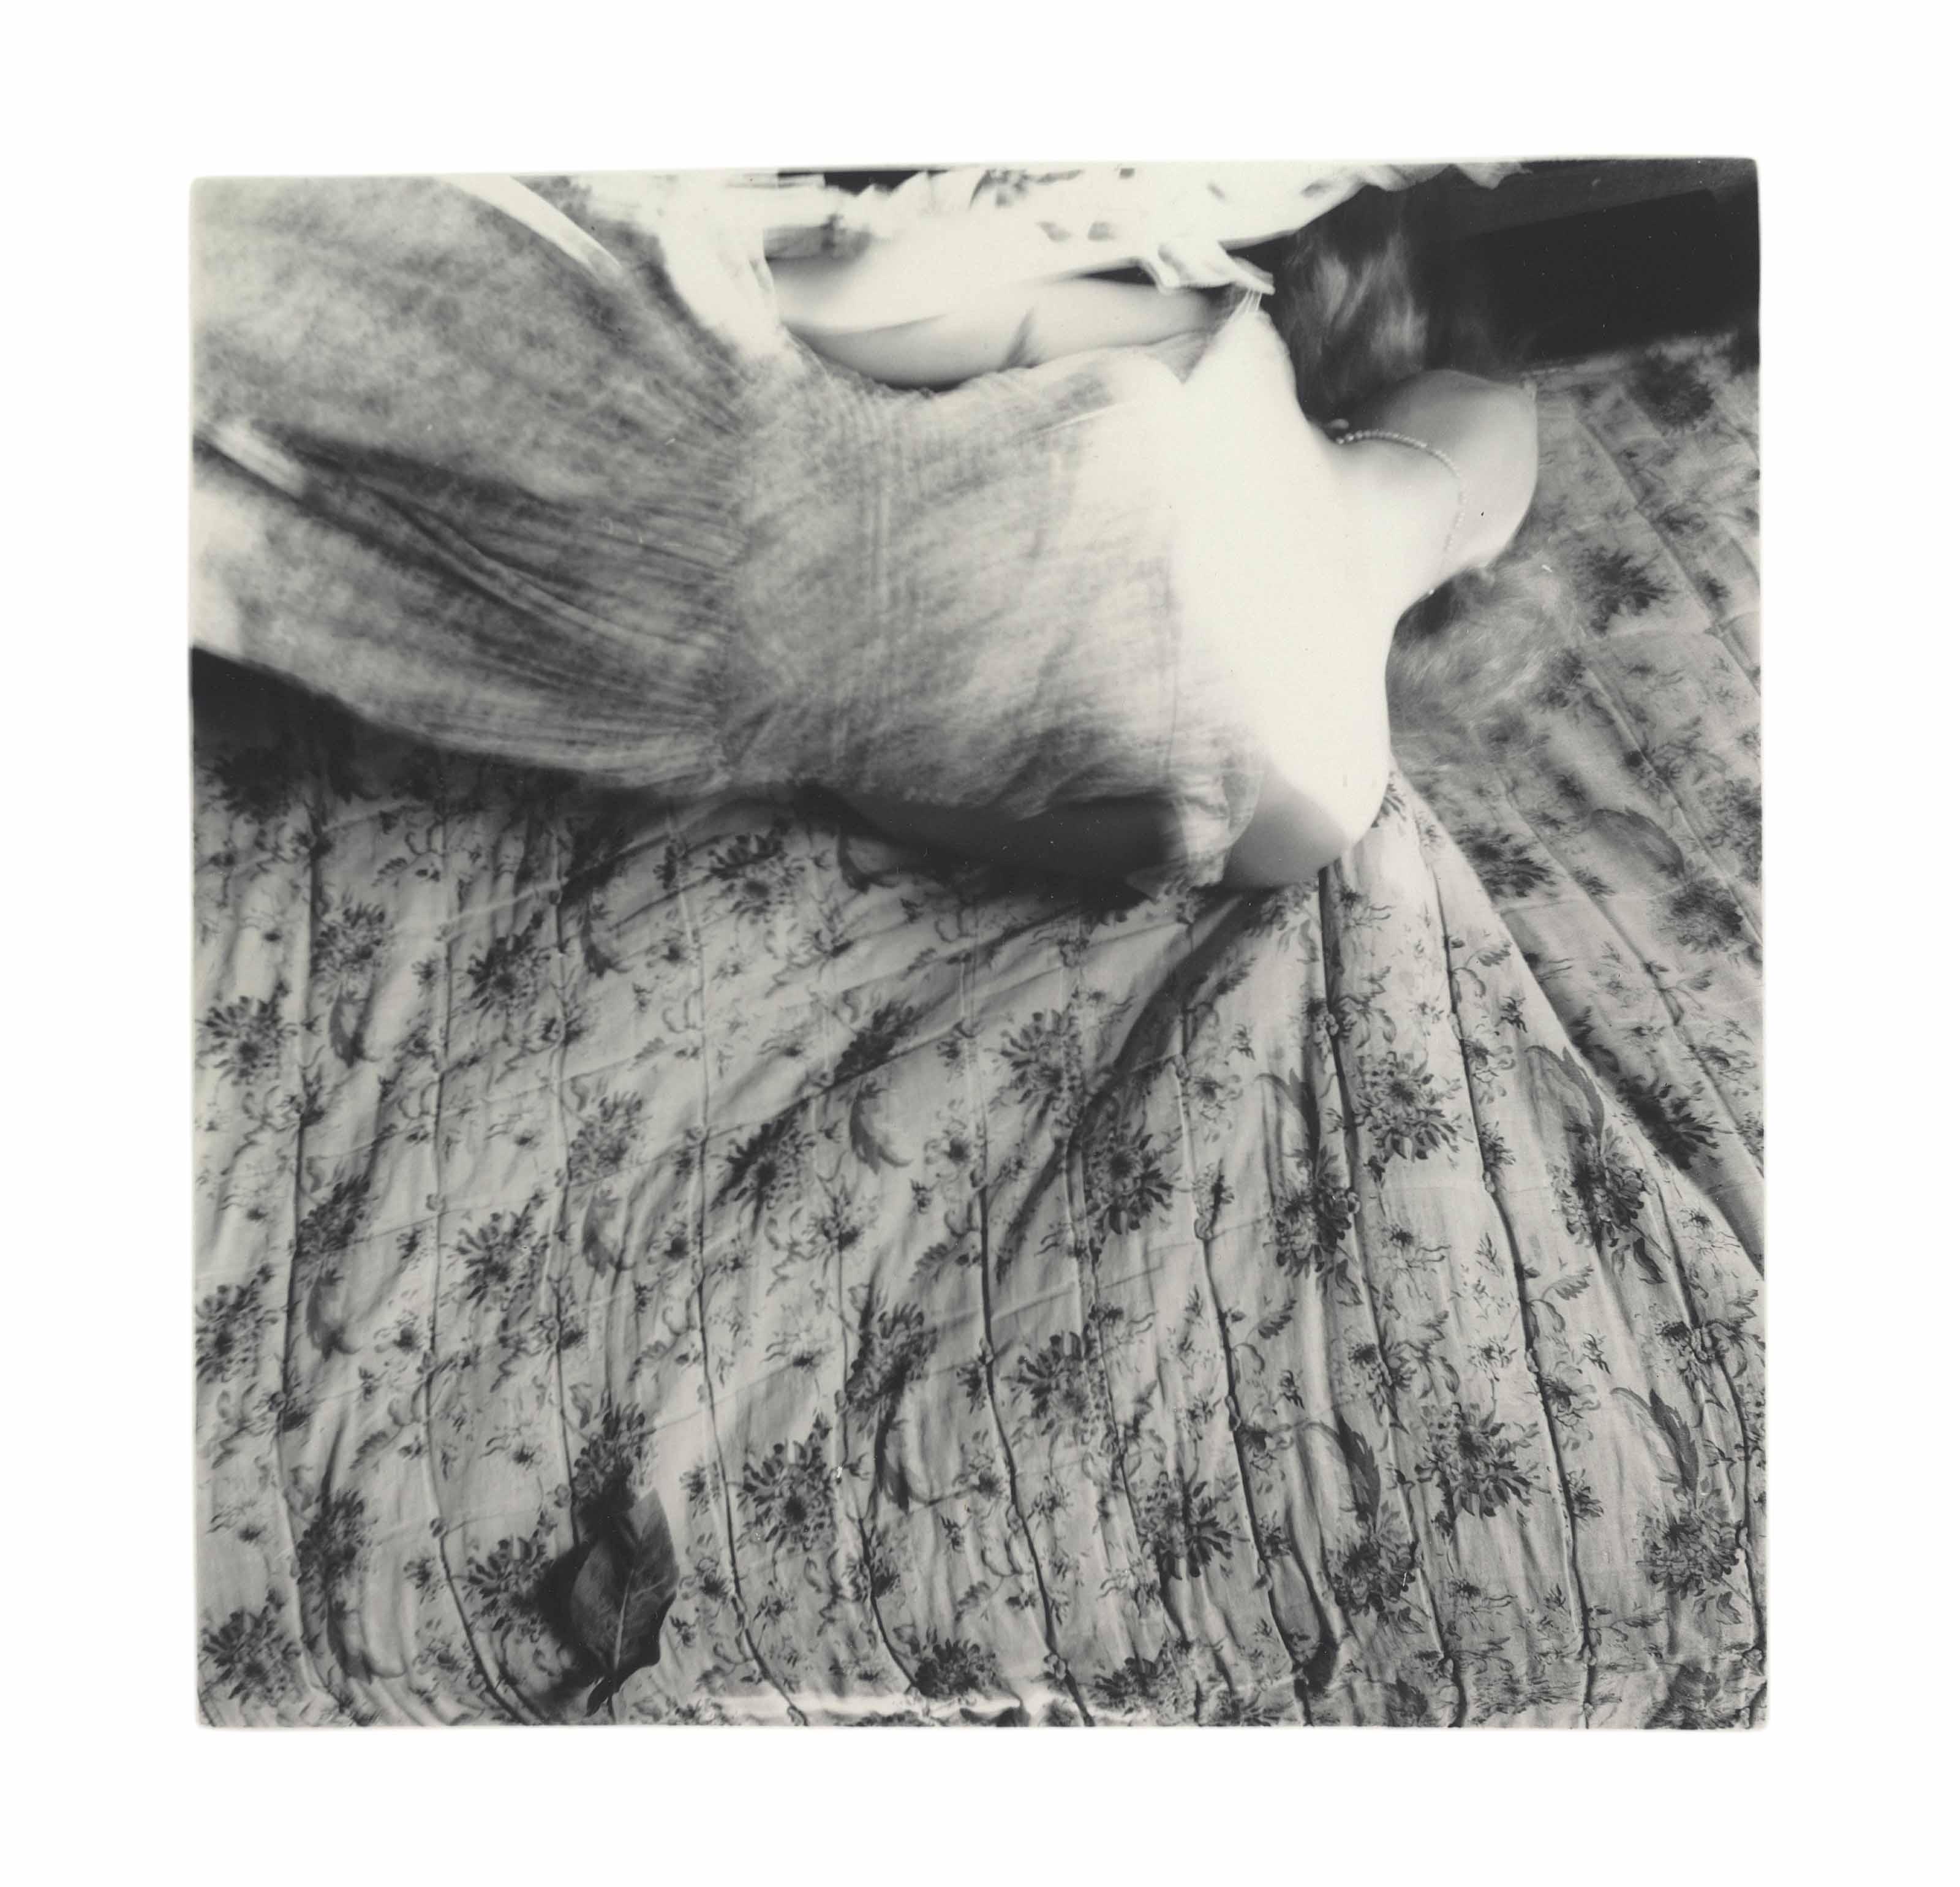 Untitled (Self-Portrait), 1977-1978